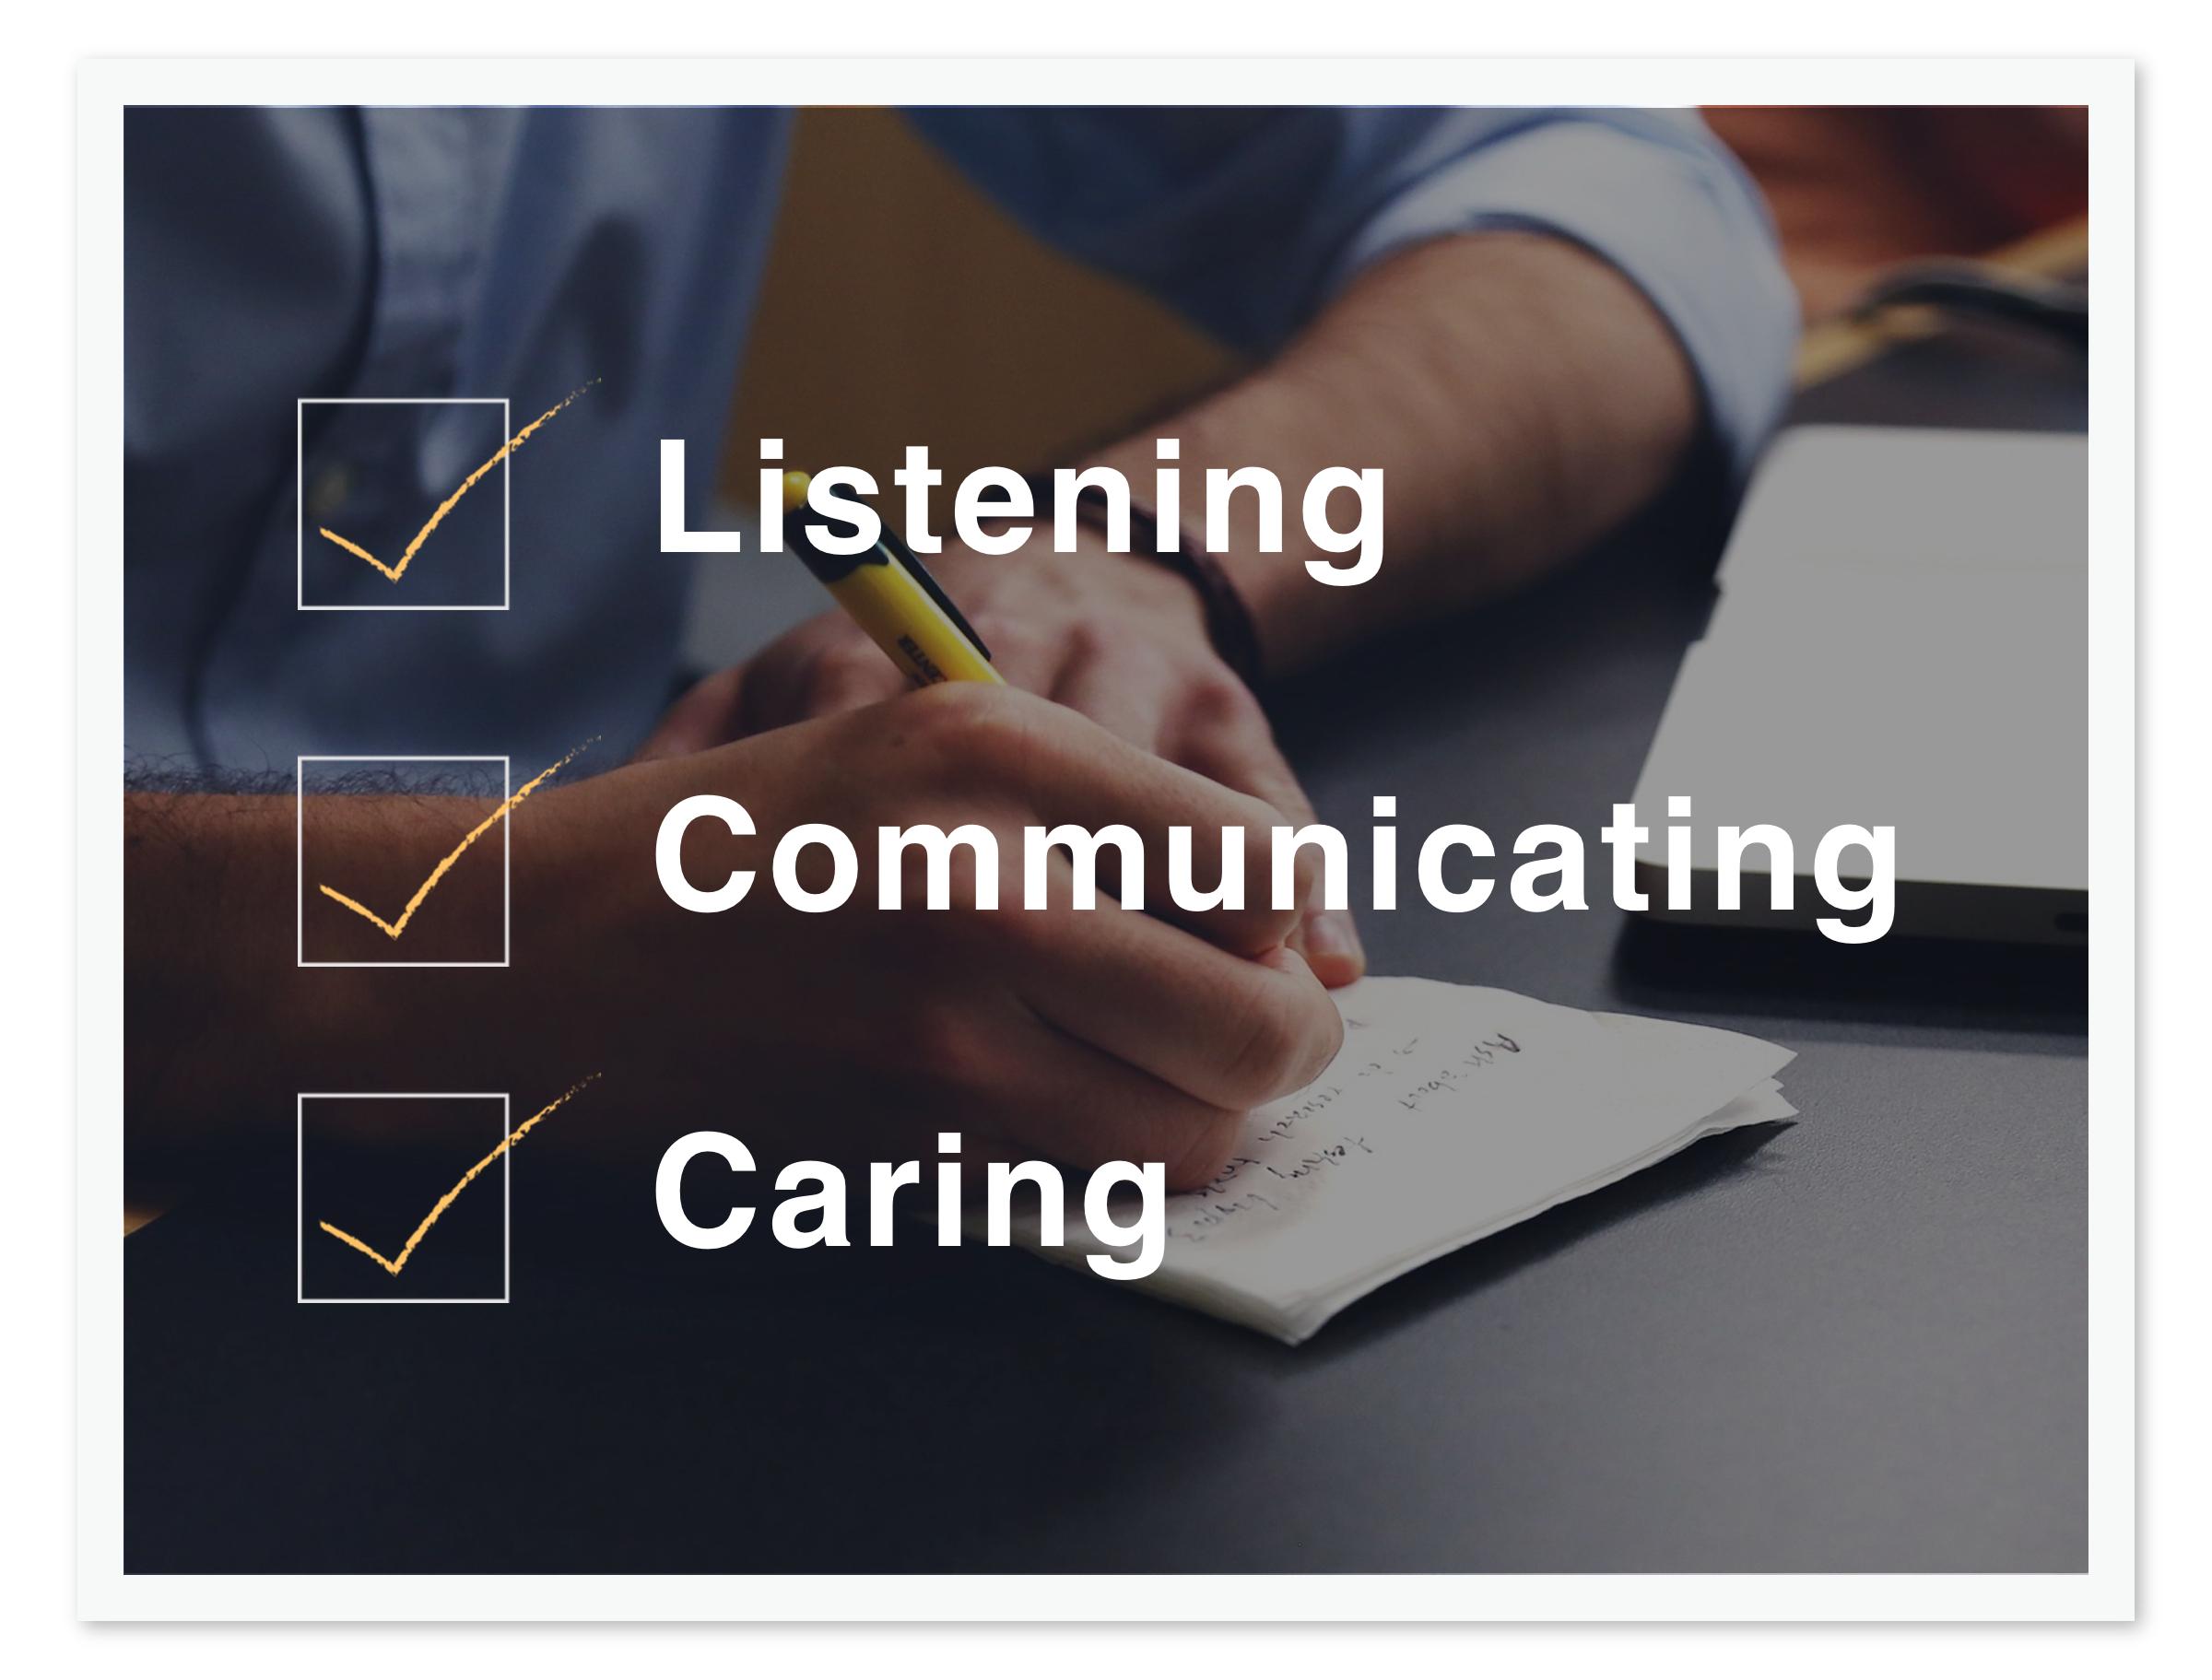 Communicate-Dr-Anthony-Giantinoto.jpg